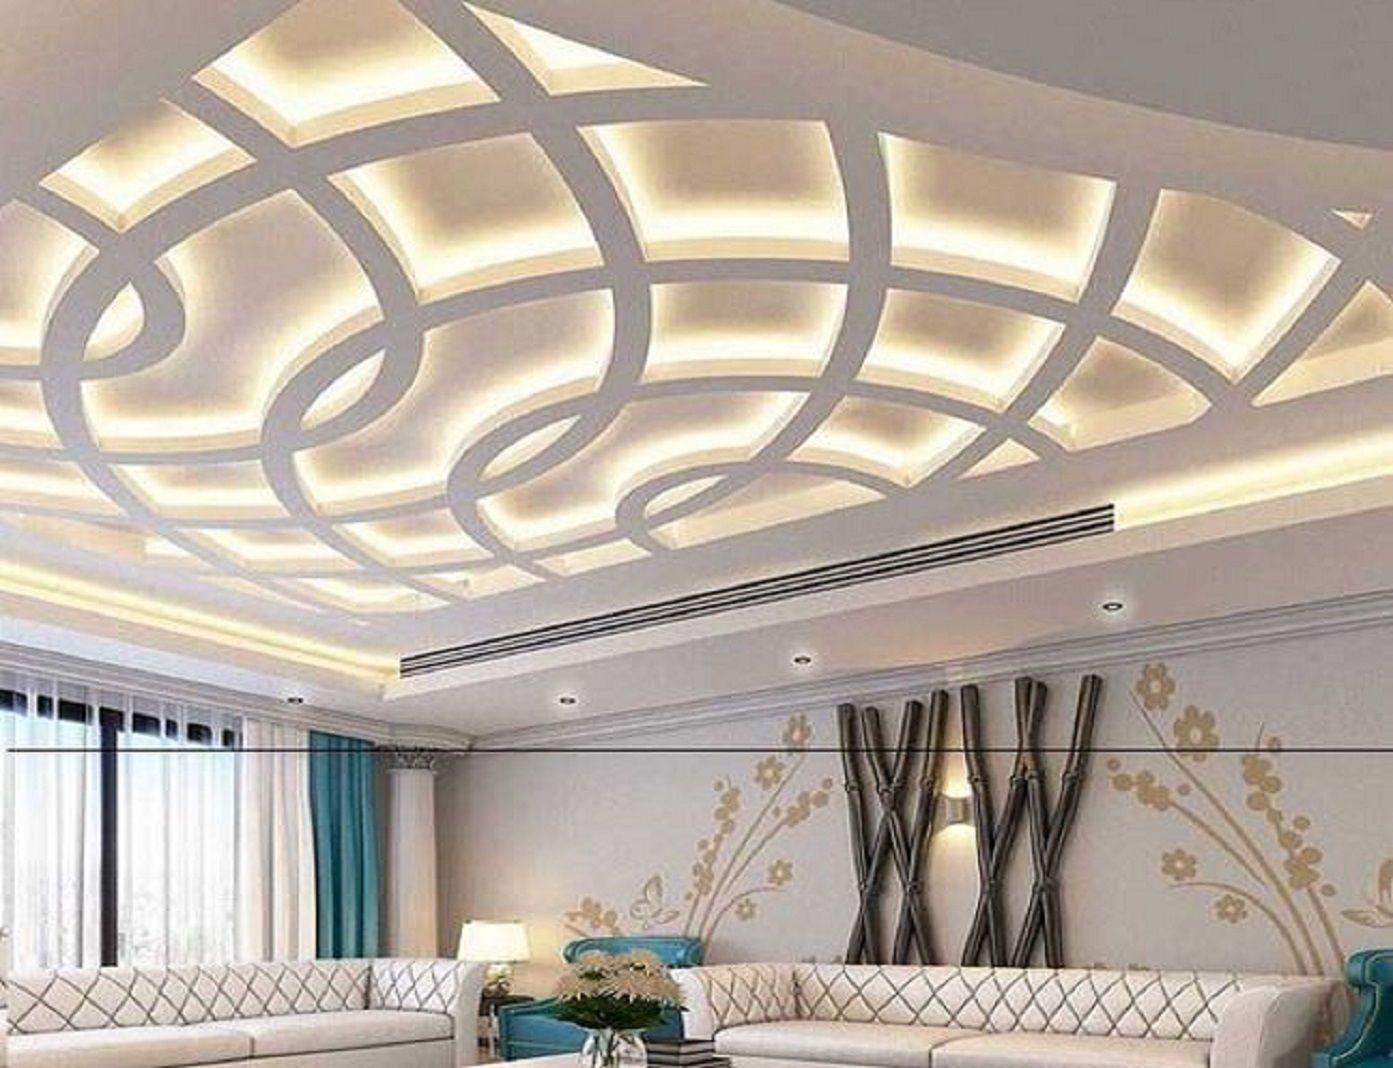 Pin by Andris Namdaris on Iluminación & Techo   False ceiling ...